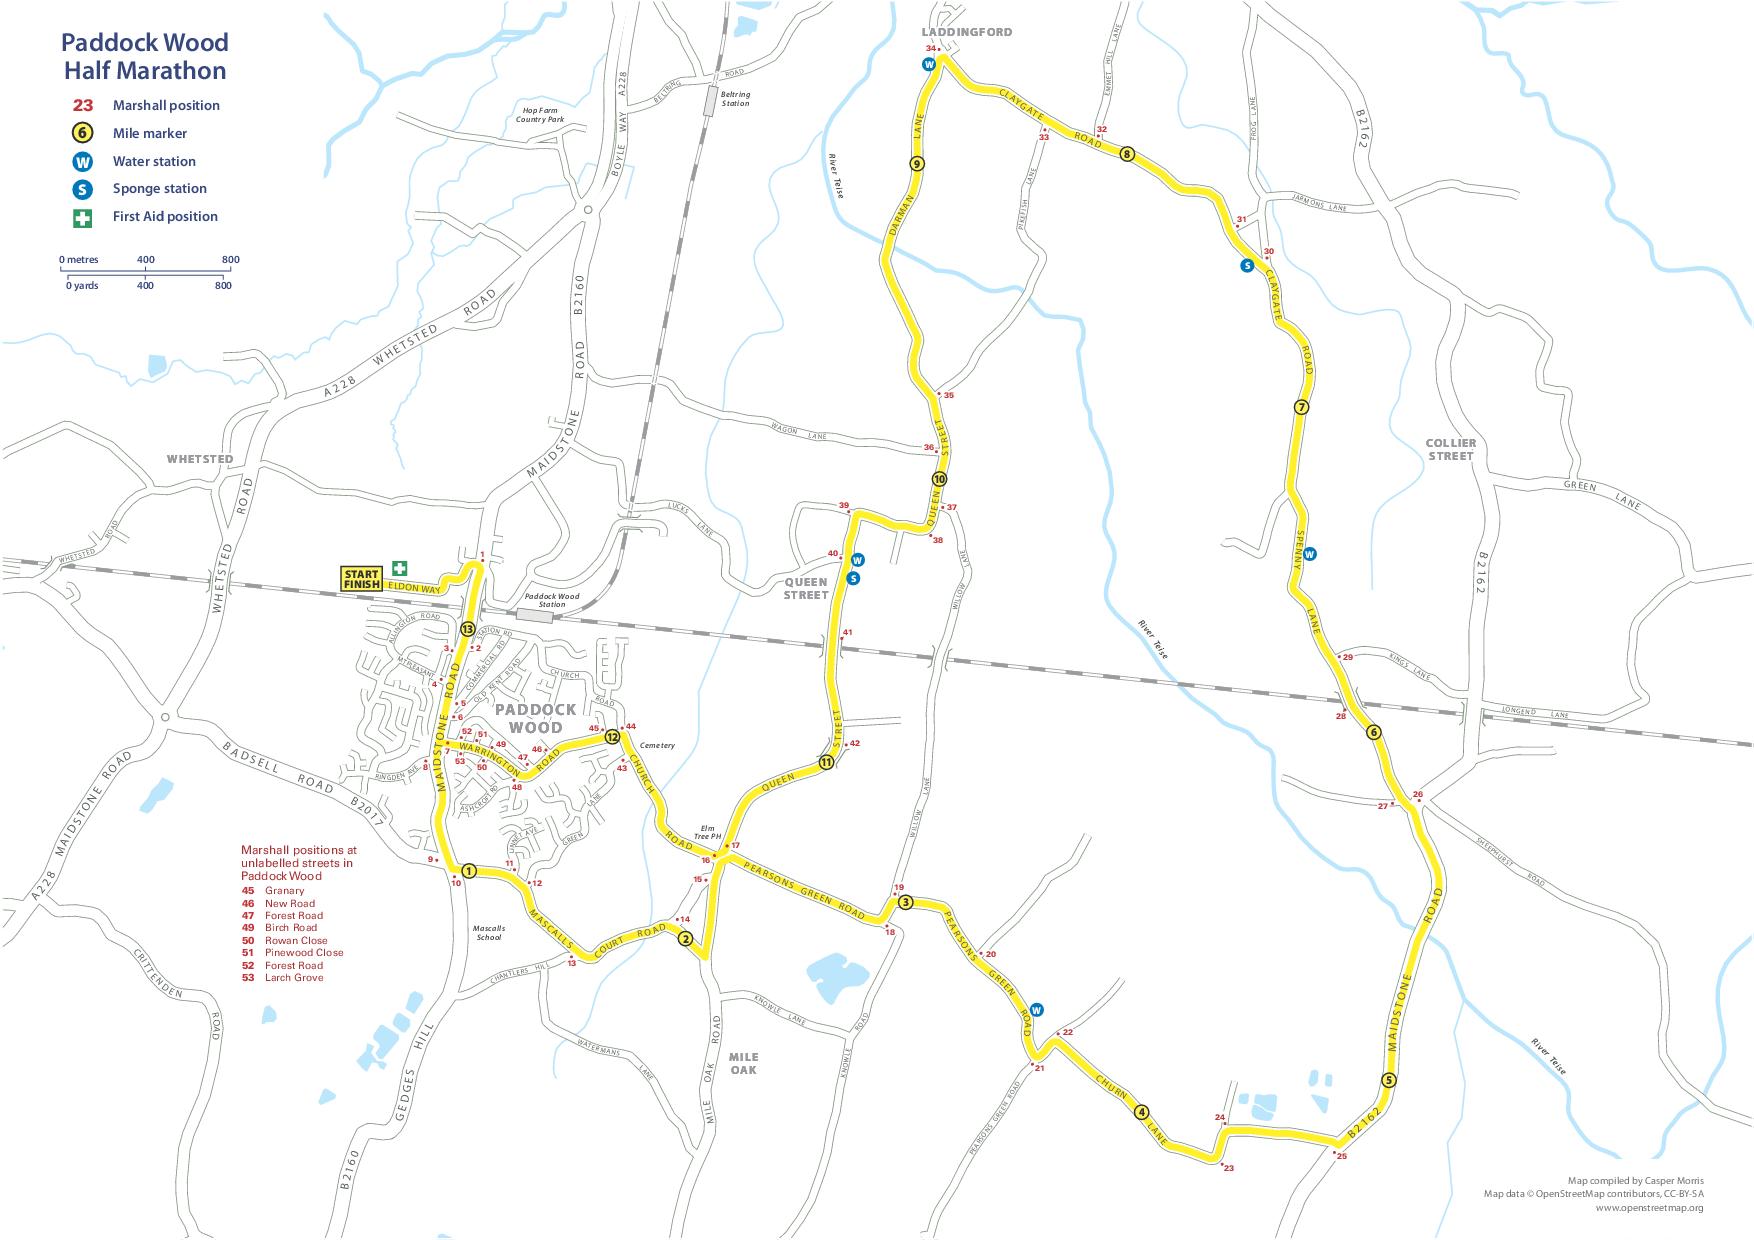 Paddock Wood Half Marathon Race Route